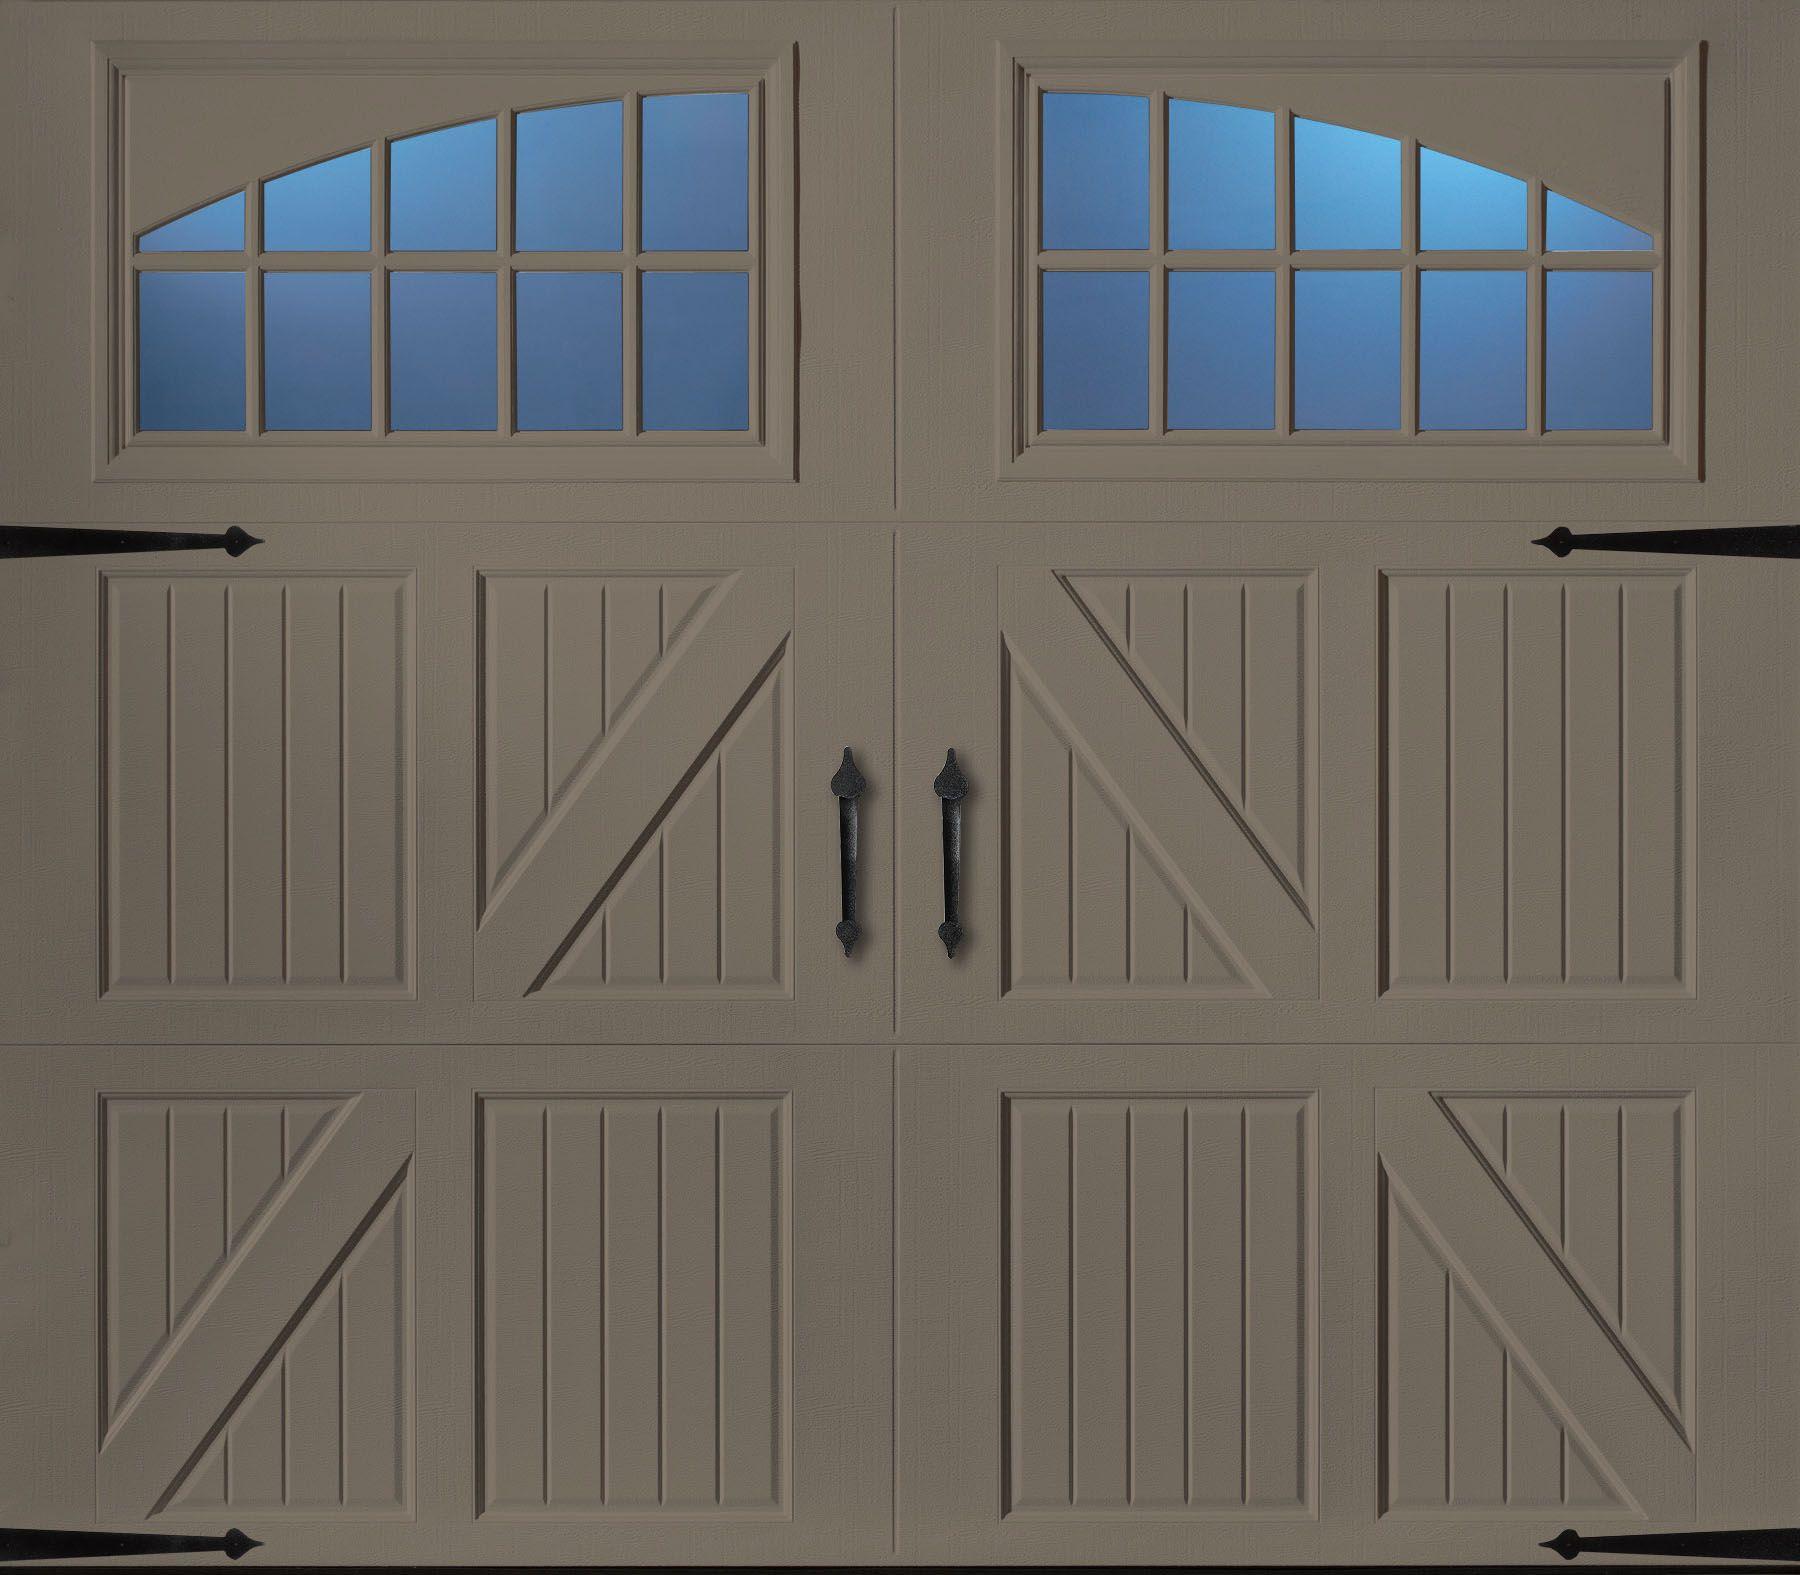 Classica northampton garage door white 9 x 8 no windows - Garage Door Amarr Tuscany W Seine Glass In Terratone